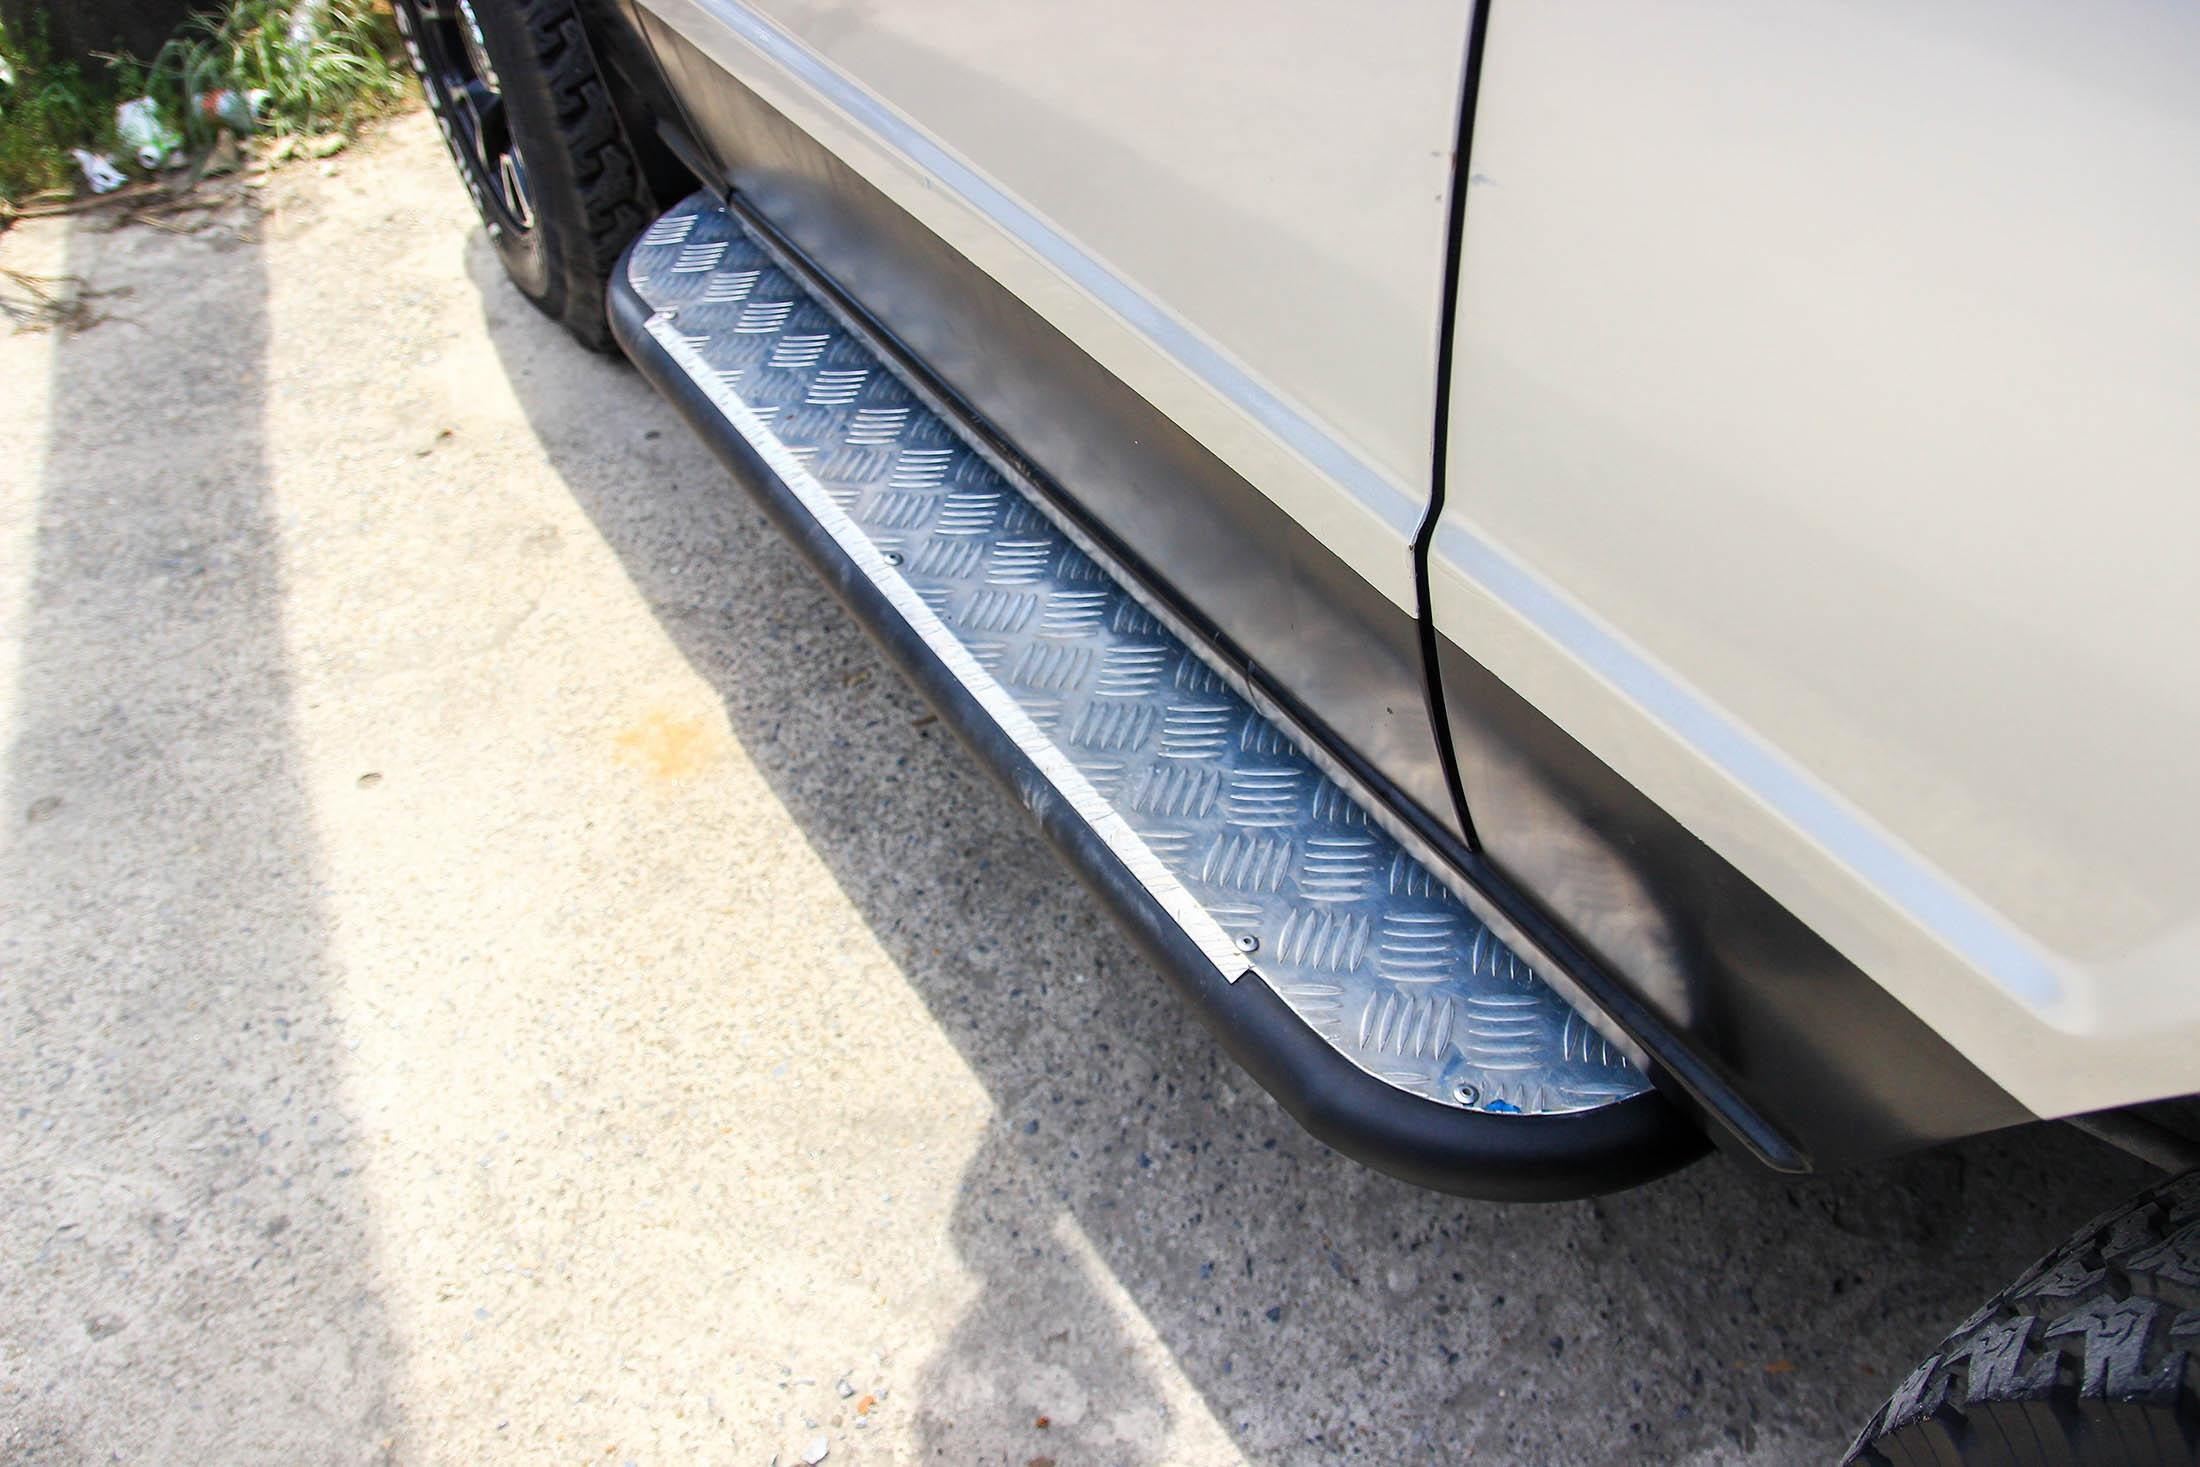 Chi tiết Dodge Raider - xe cổ hiếm gặp tại Việt Nam Ảnh 10